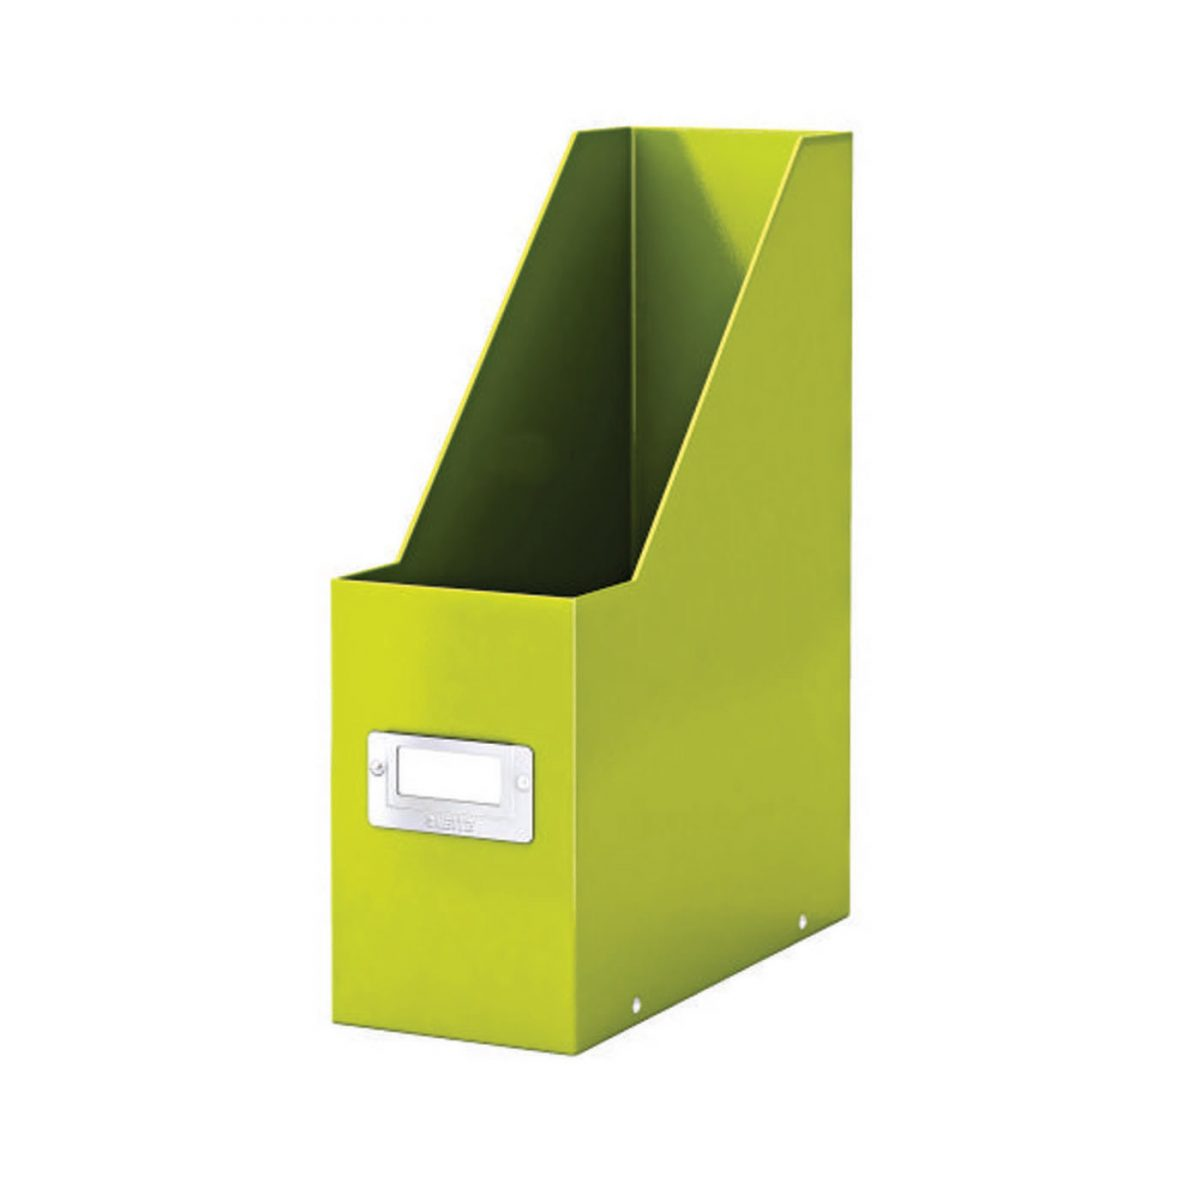 Suport vertical LEITZ Click & Store pentru documente, carton laminat - verde